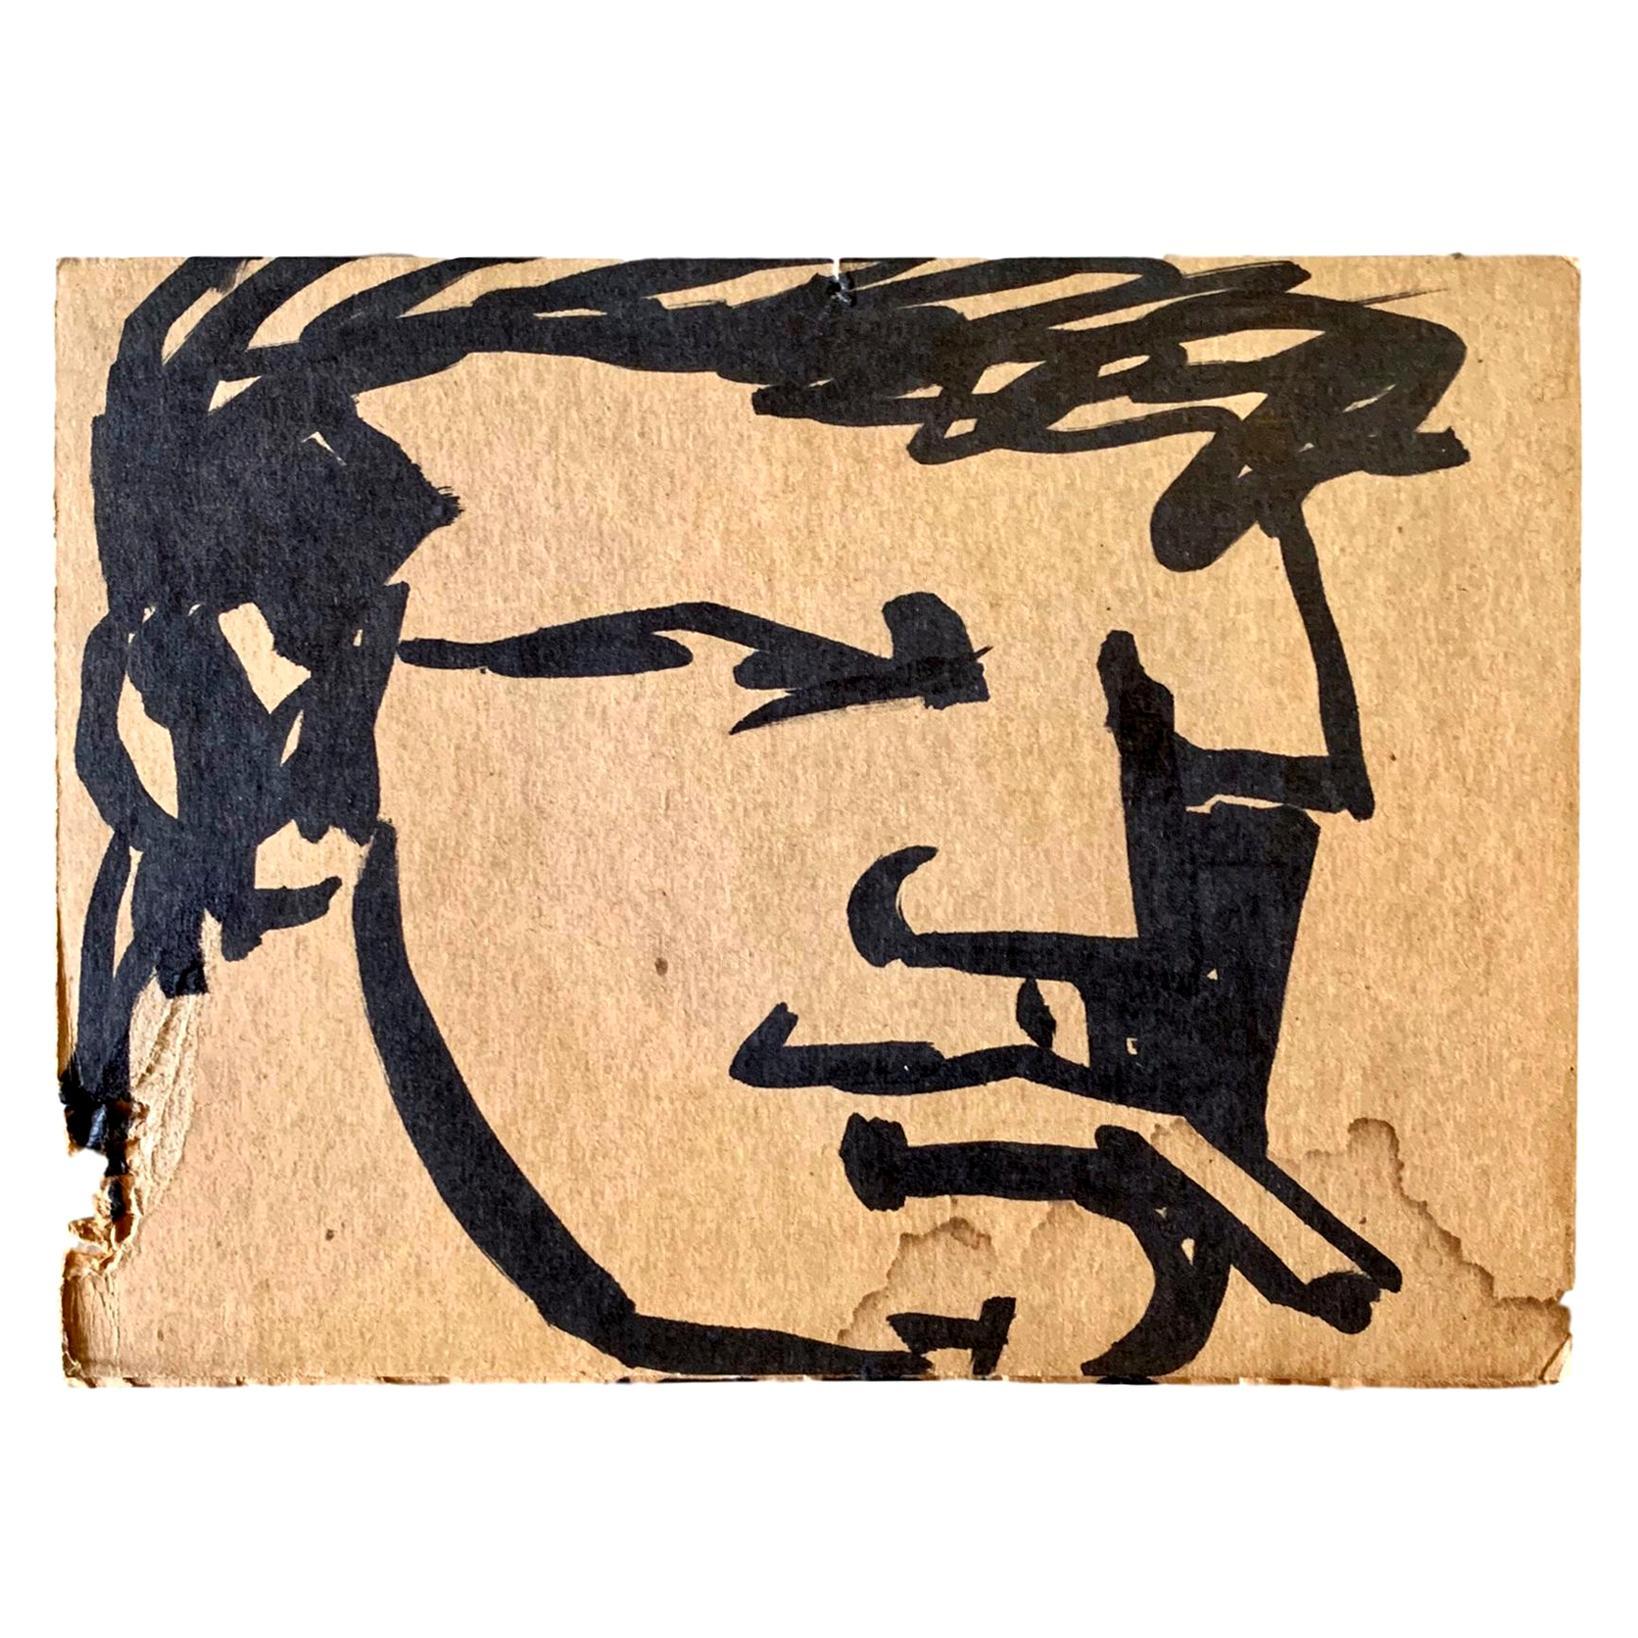 Robert Loughlin Original Drawing on Cardboard